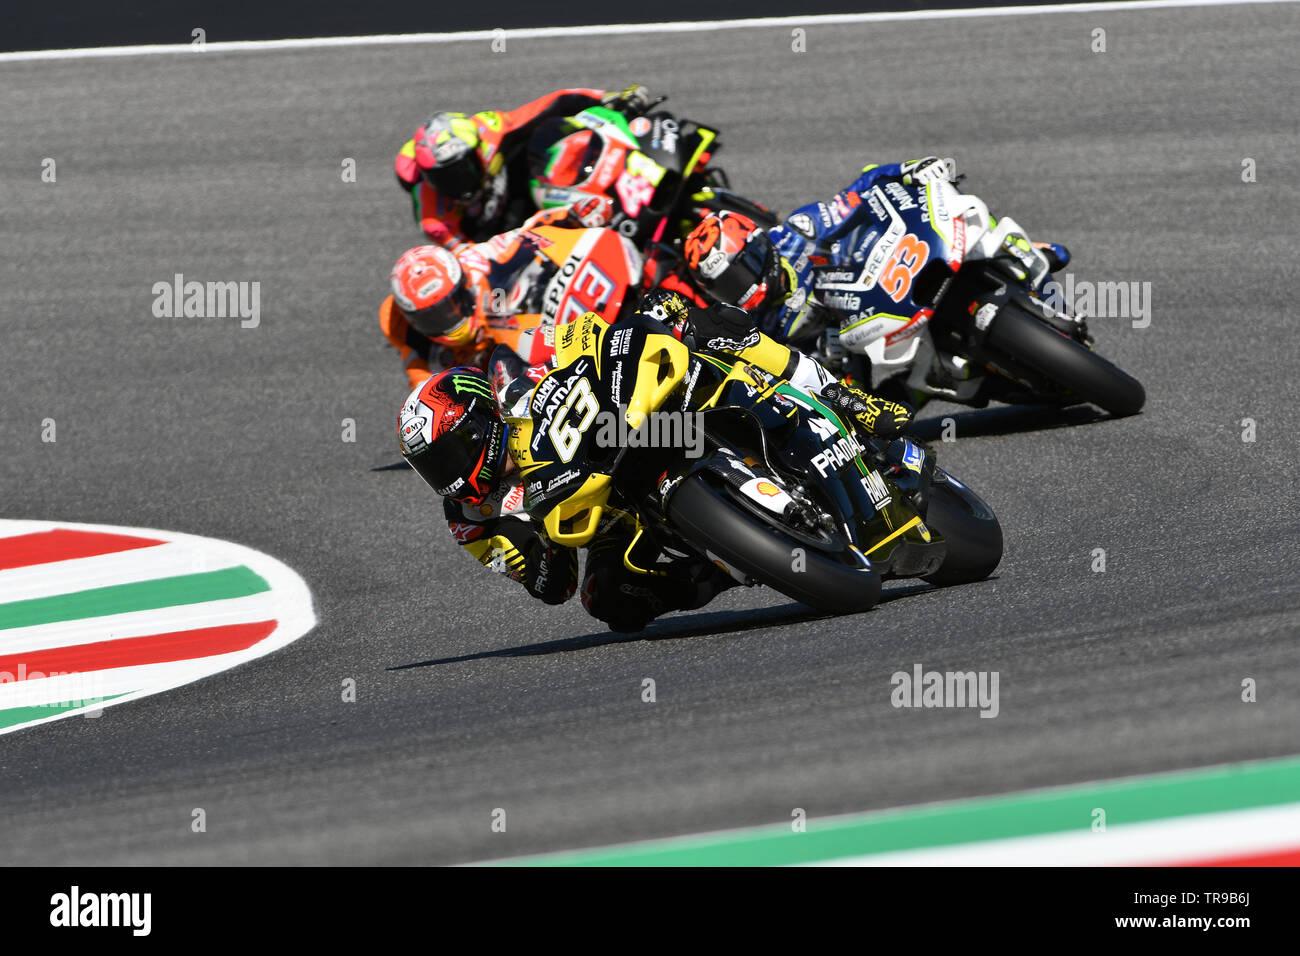 Mugello - ITALY, 30 May 2019: Italian Ducati Alma Pramac Team Rider Francesco  Bagnaia in action at 2019 GP of Italy of MotoGP on May 2019 in Italy Stock  Photo: 255288618 - Alamy